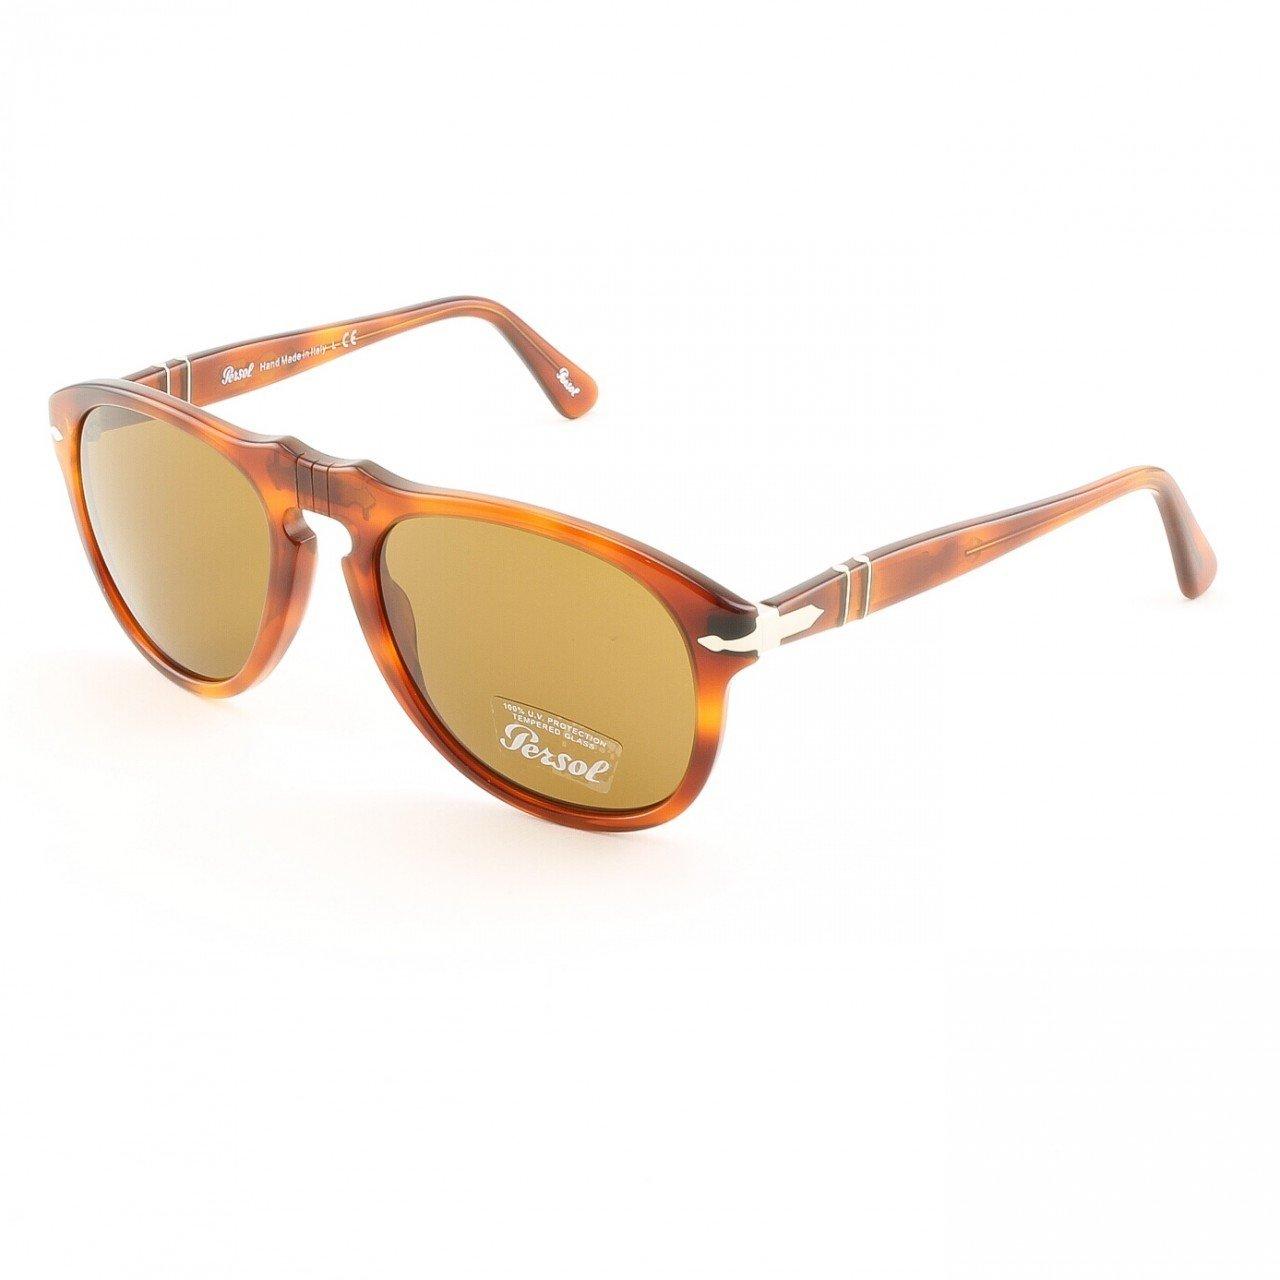 Persol 714 96/33 54mm Folding Sunglasses Light Havana Brown Crystal Lens PO0714